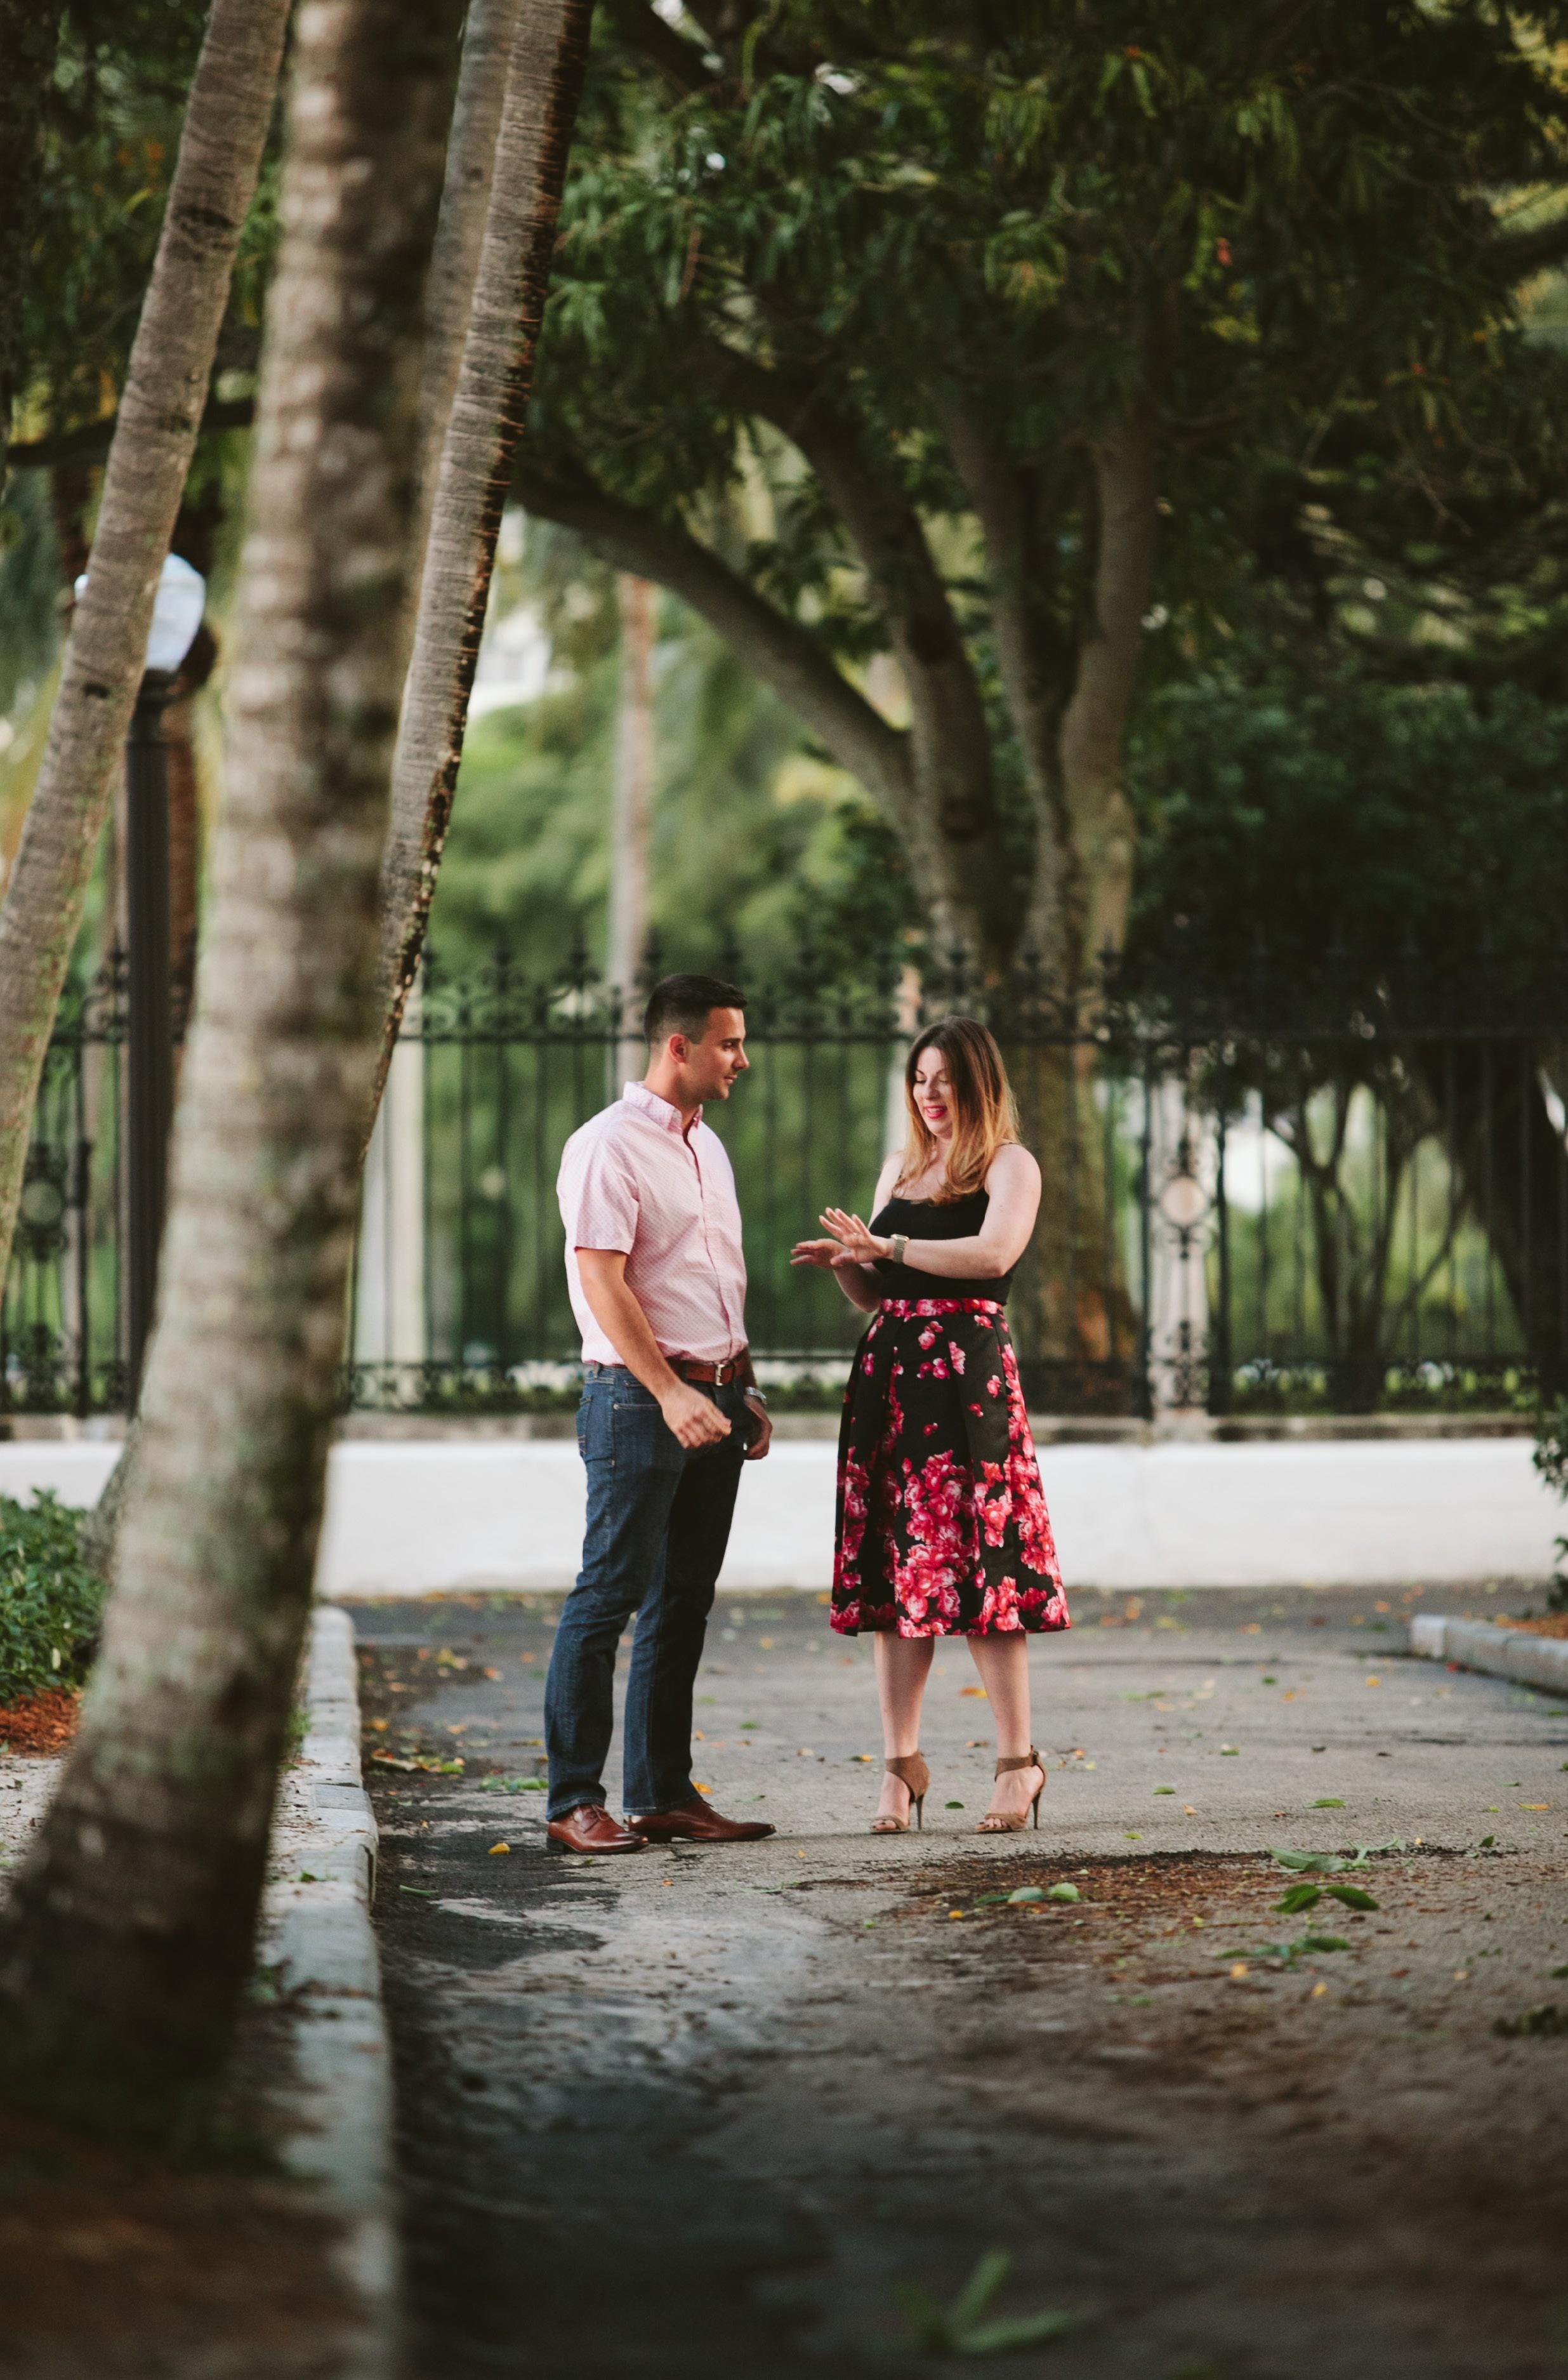 Ida + Danny Surprise Proposal Engagement Shoot at Flagler Museum Palm Beach4.jpg